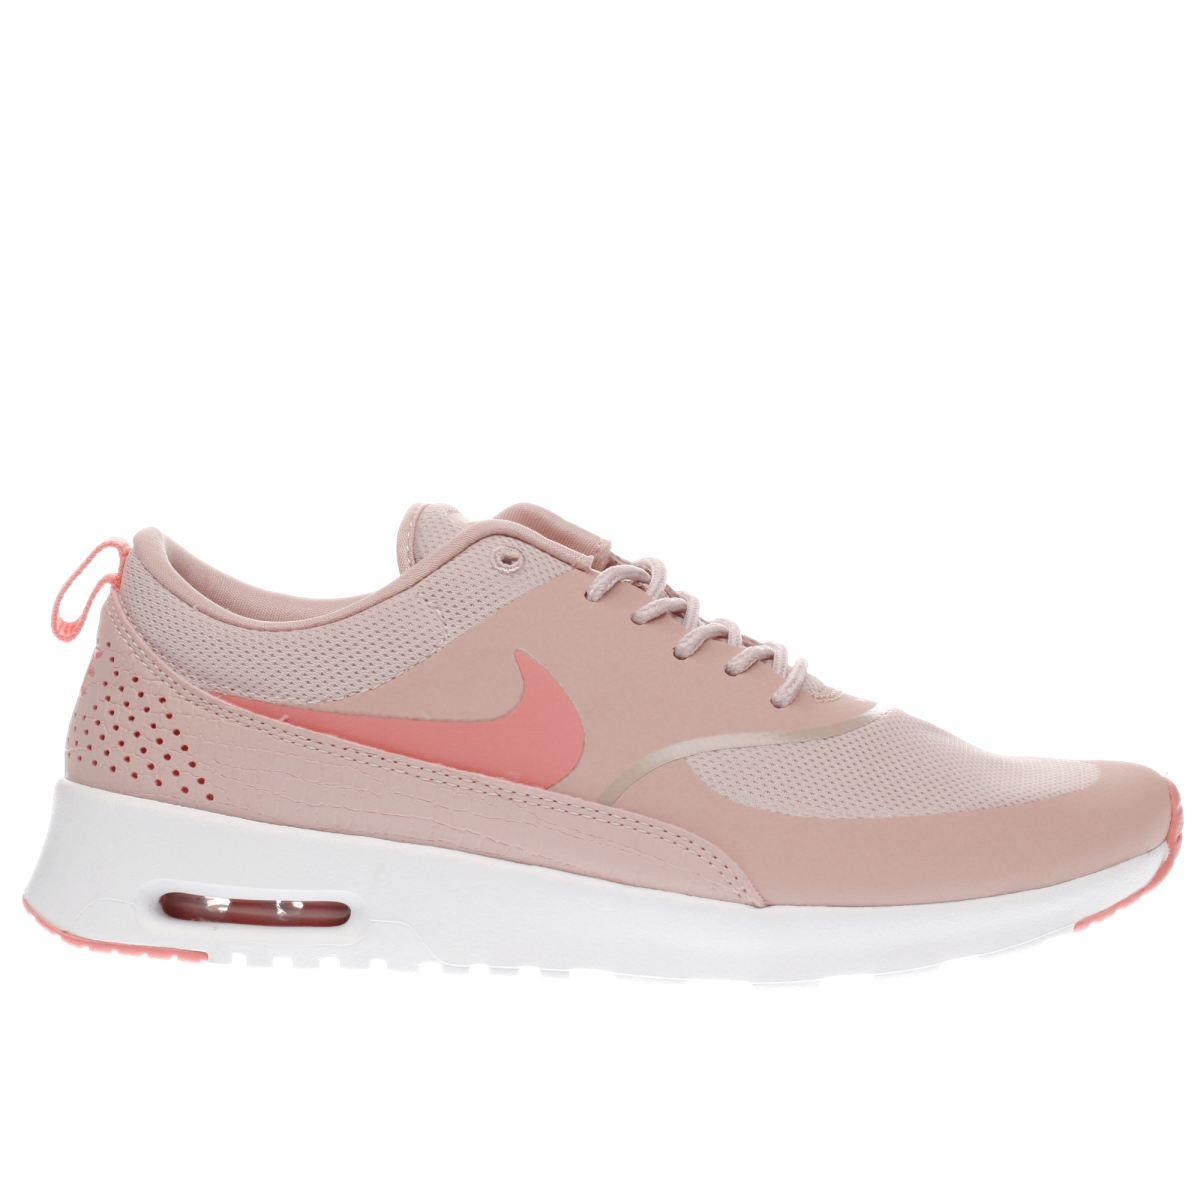 Nike Air Max Thea Womens Pink  a4159ce2d7